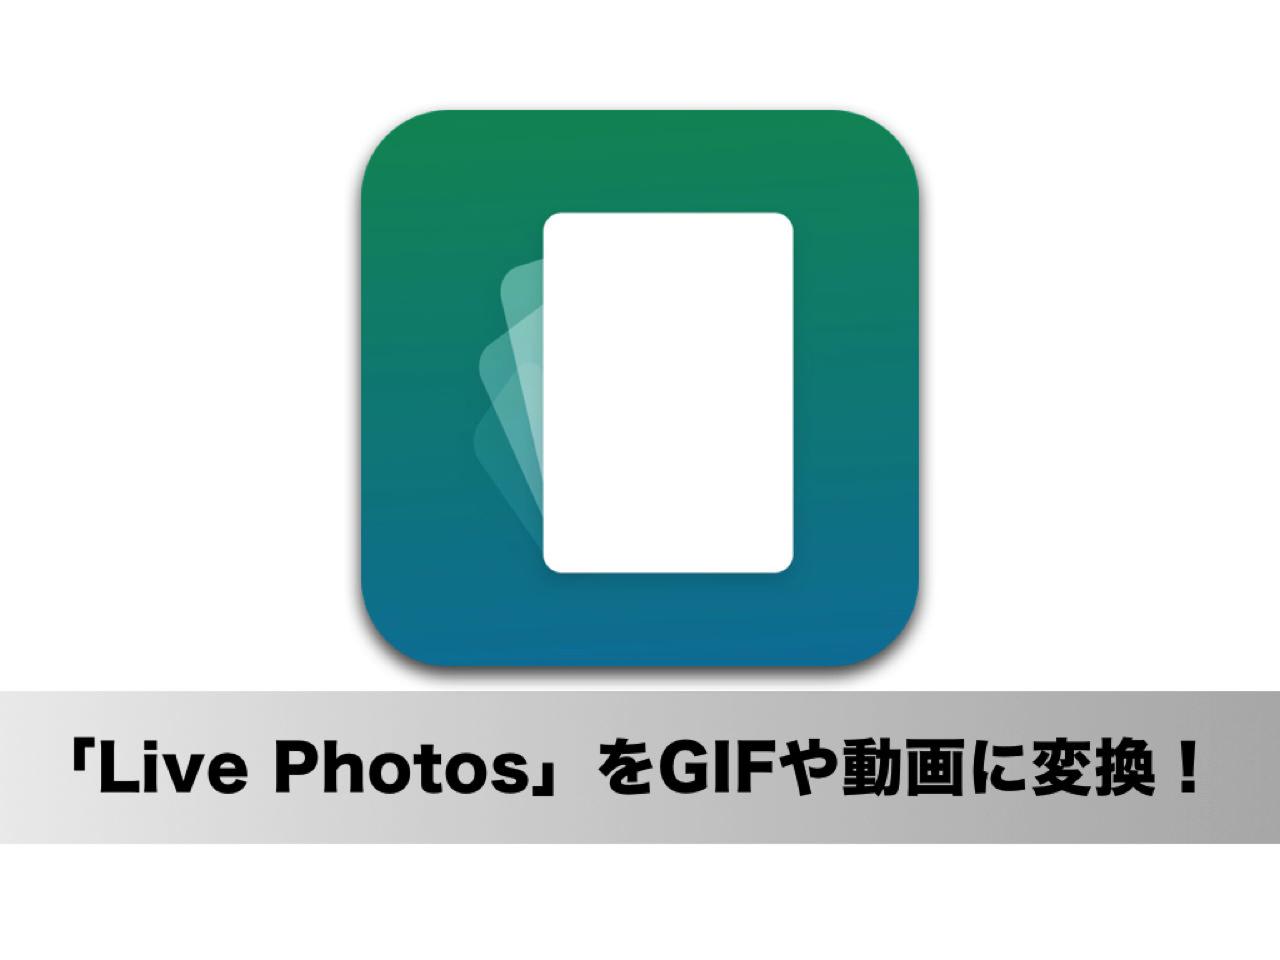 「Live Photos」をGIFや動画に変換できるiPhoneアプリ「Lively」